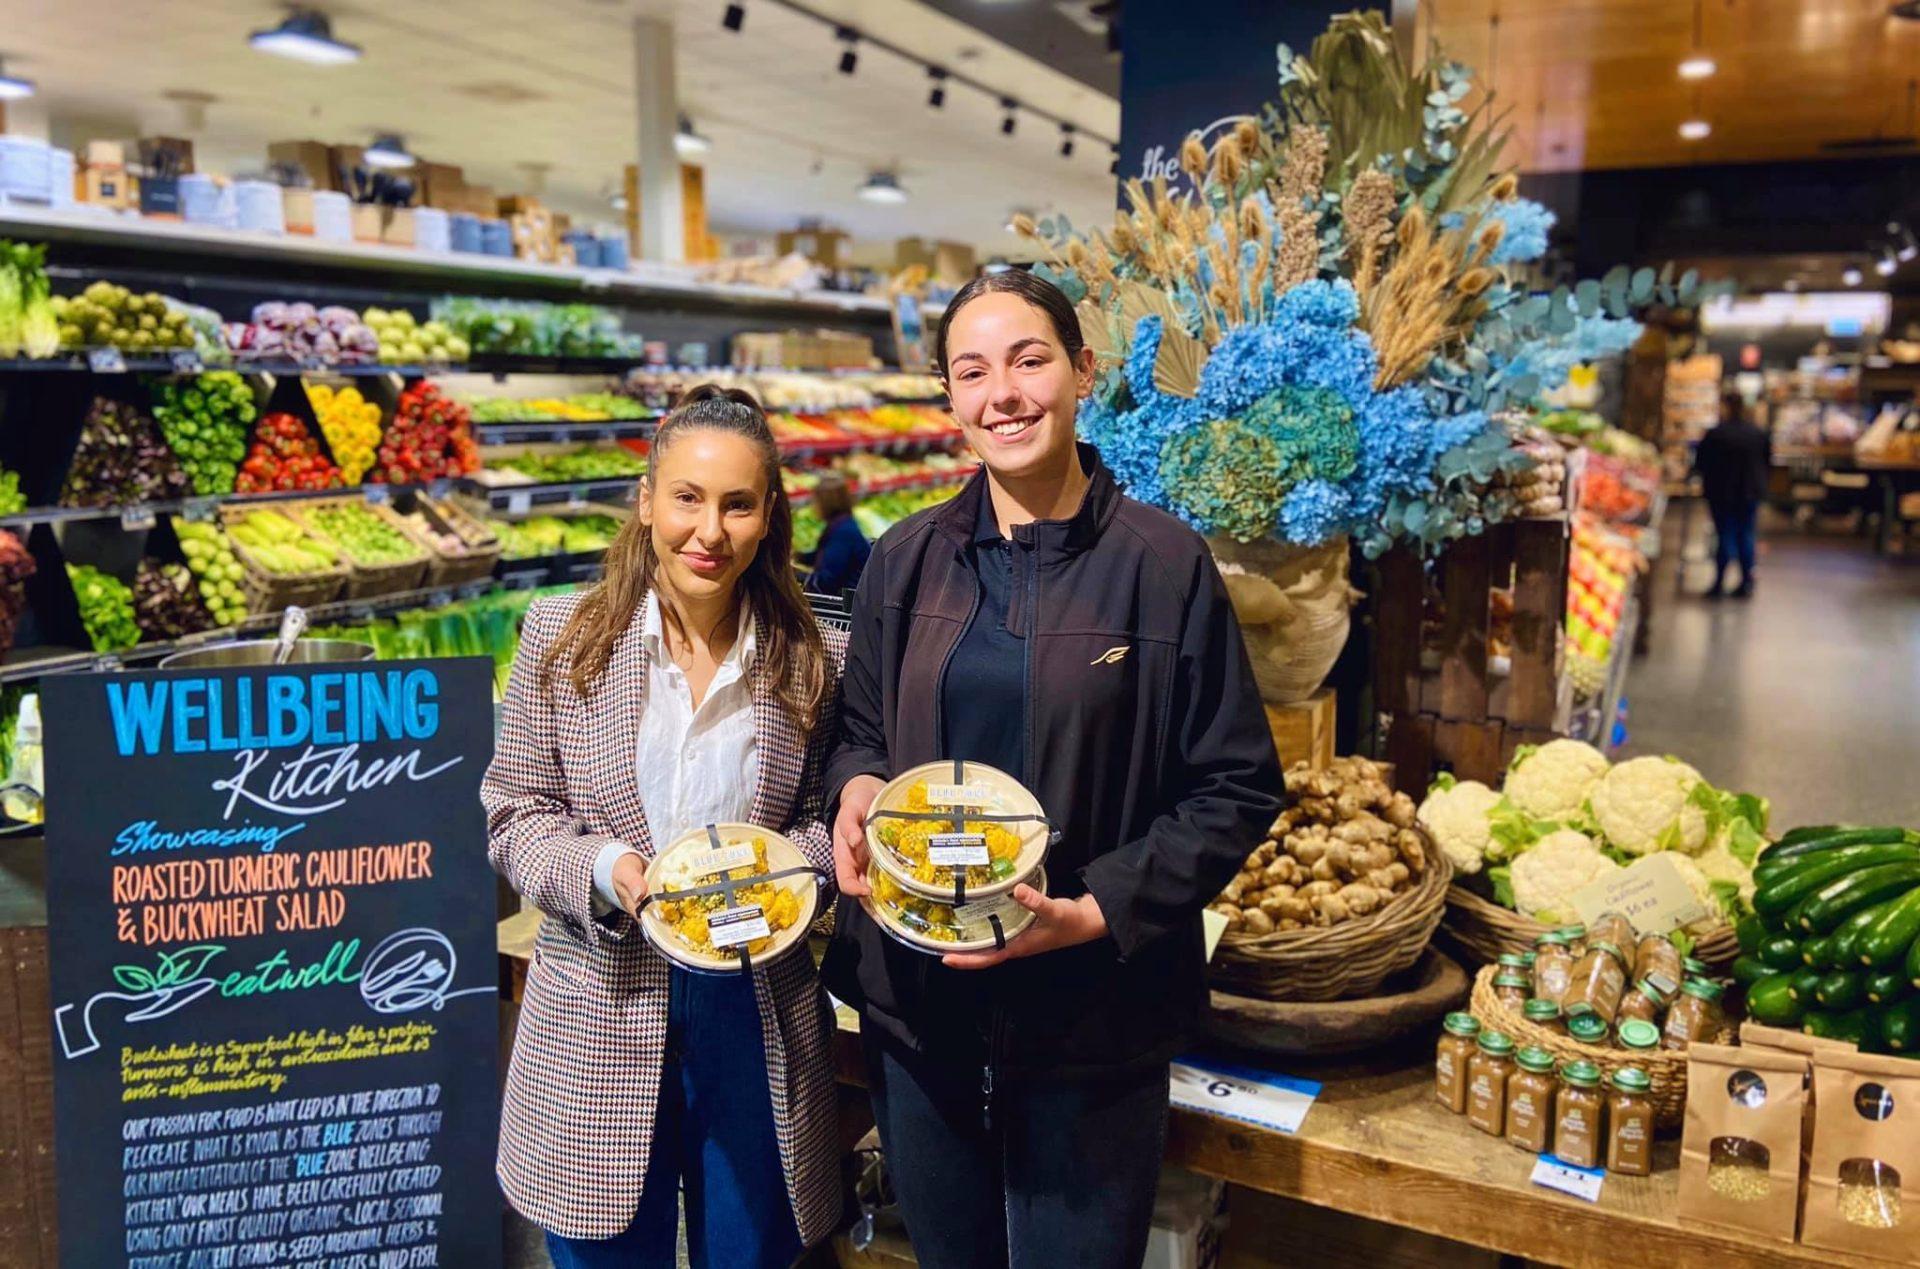 Blue Zone Wellbeing Kitchen's Healthy Meals